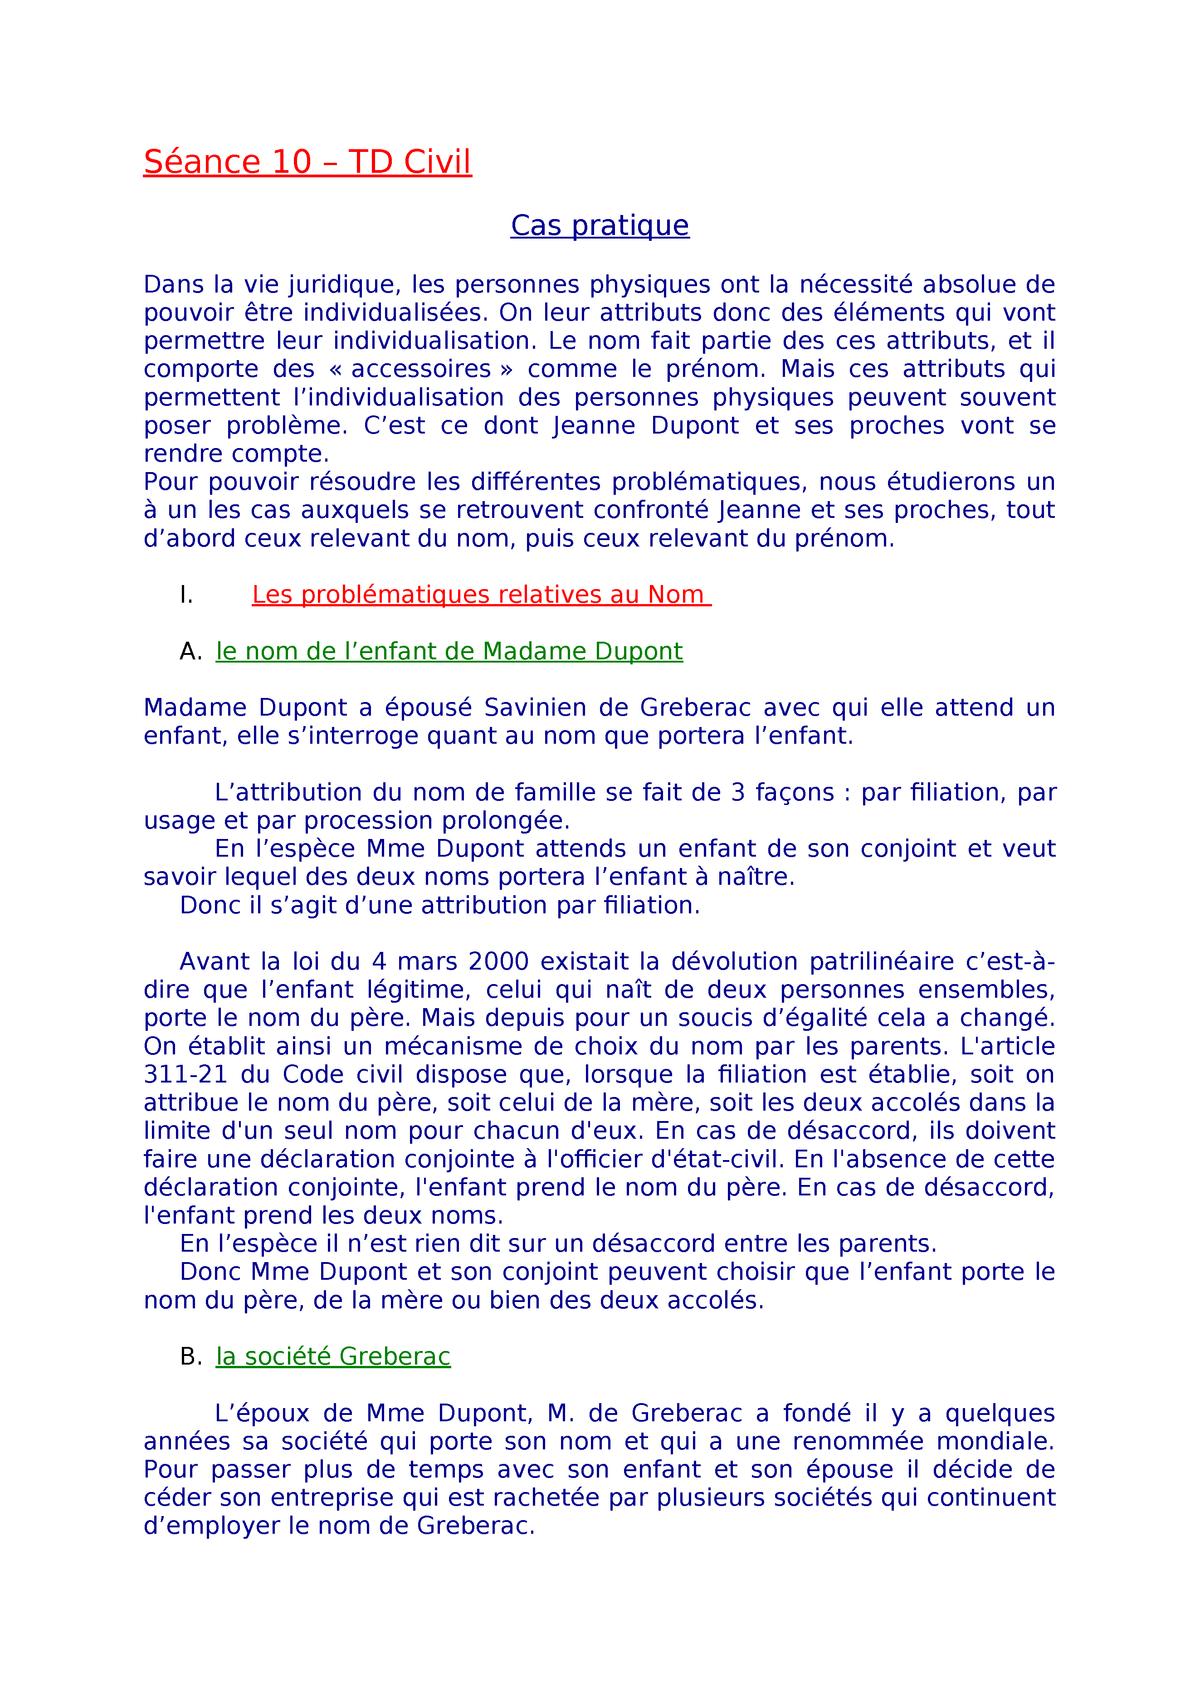 Seance 10 Td Civil Travail Perso Correction L1 Studocu